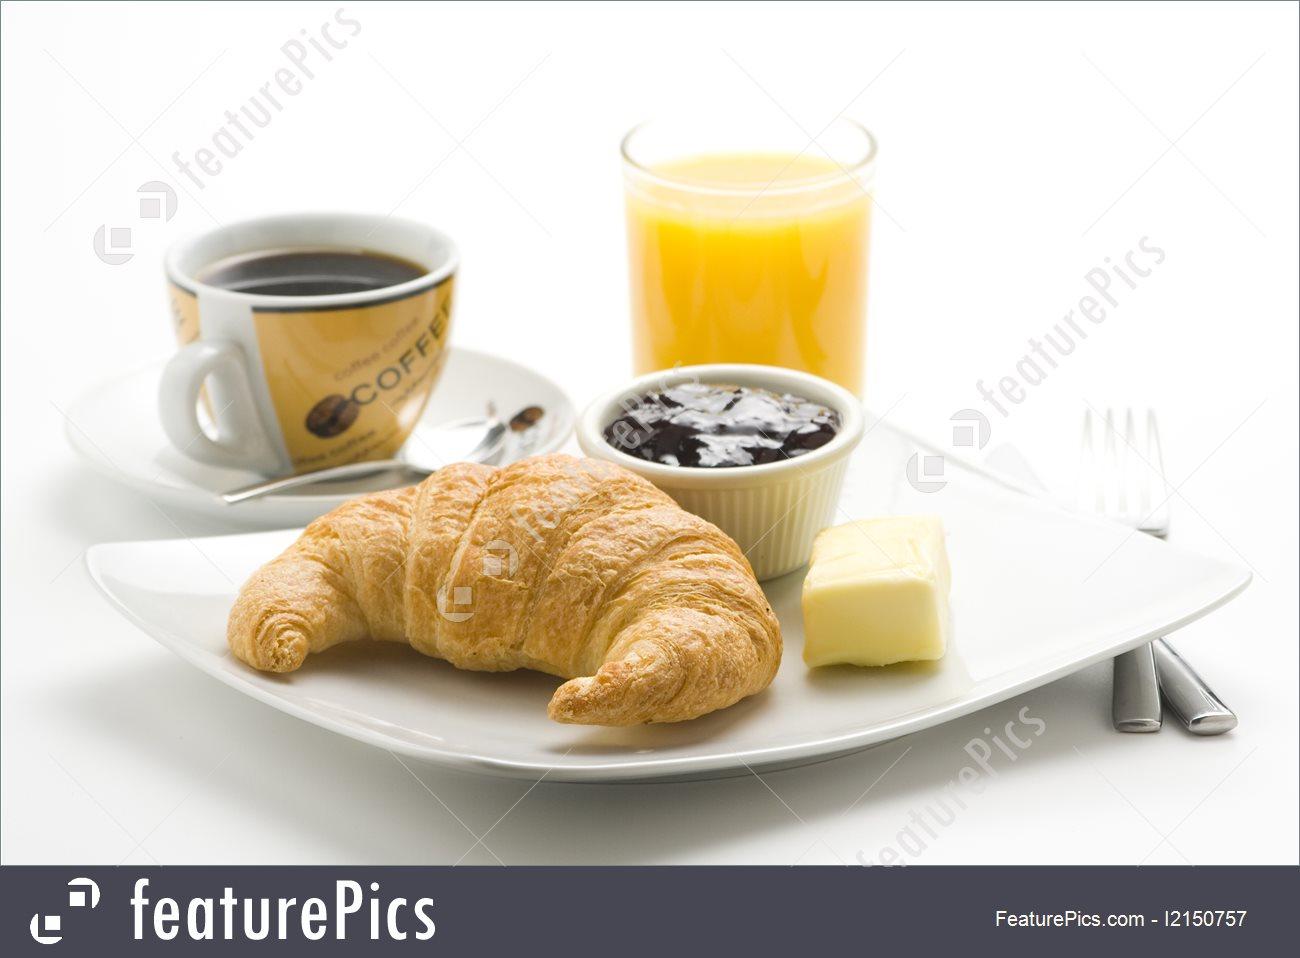 Práve som vstal - Stránka 6 Continental-breakfast-stock-picture-1150757